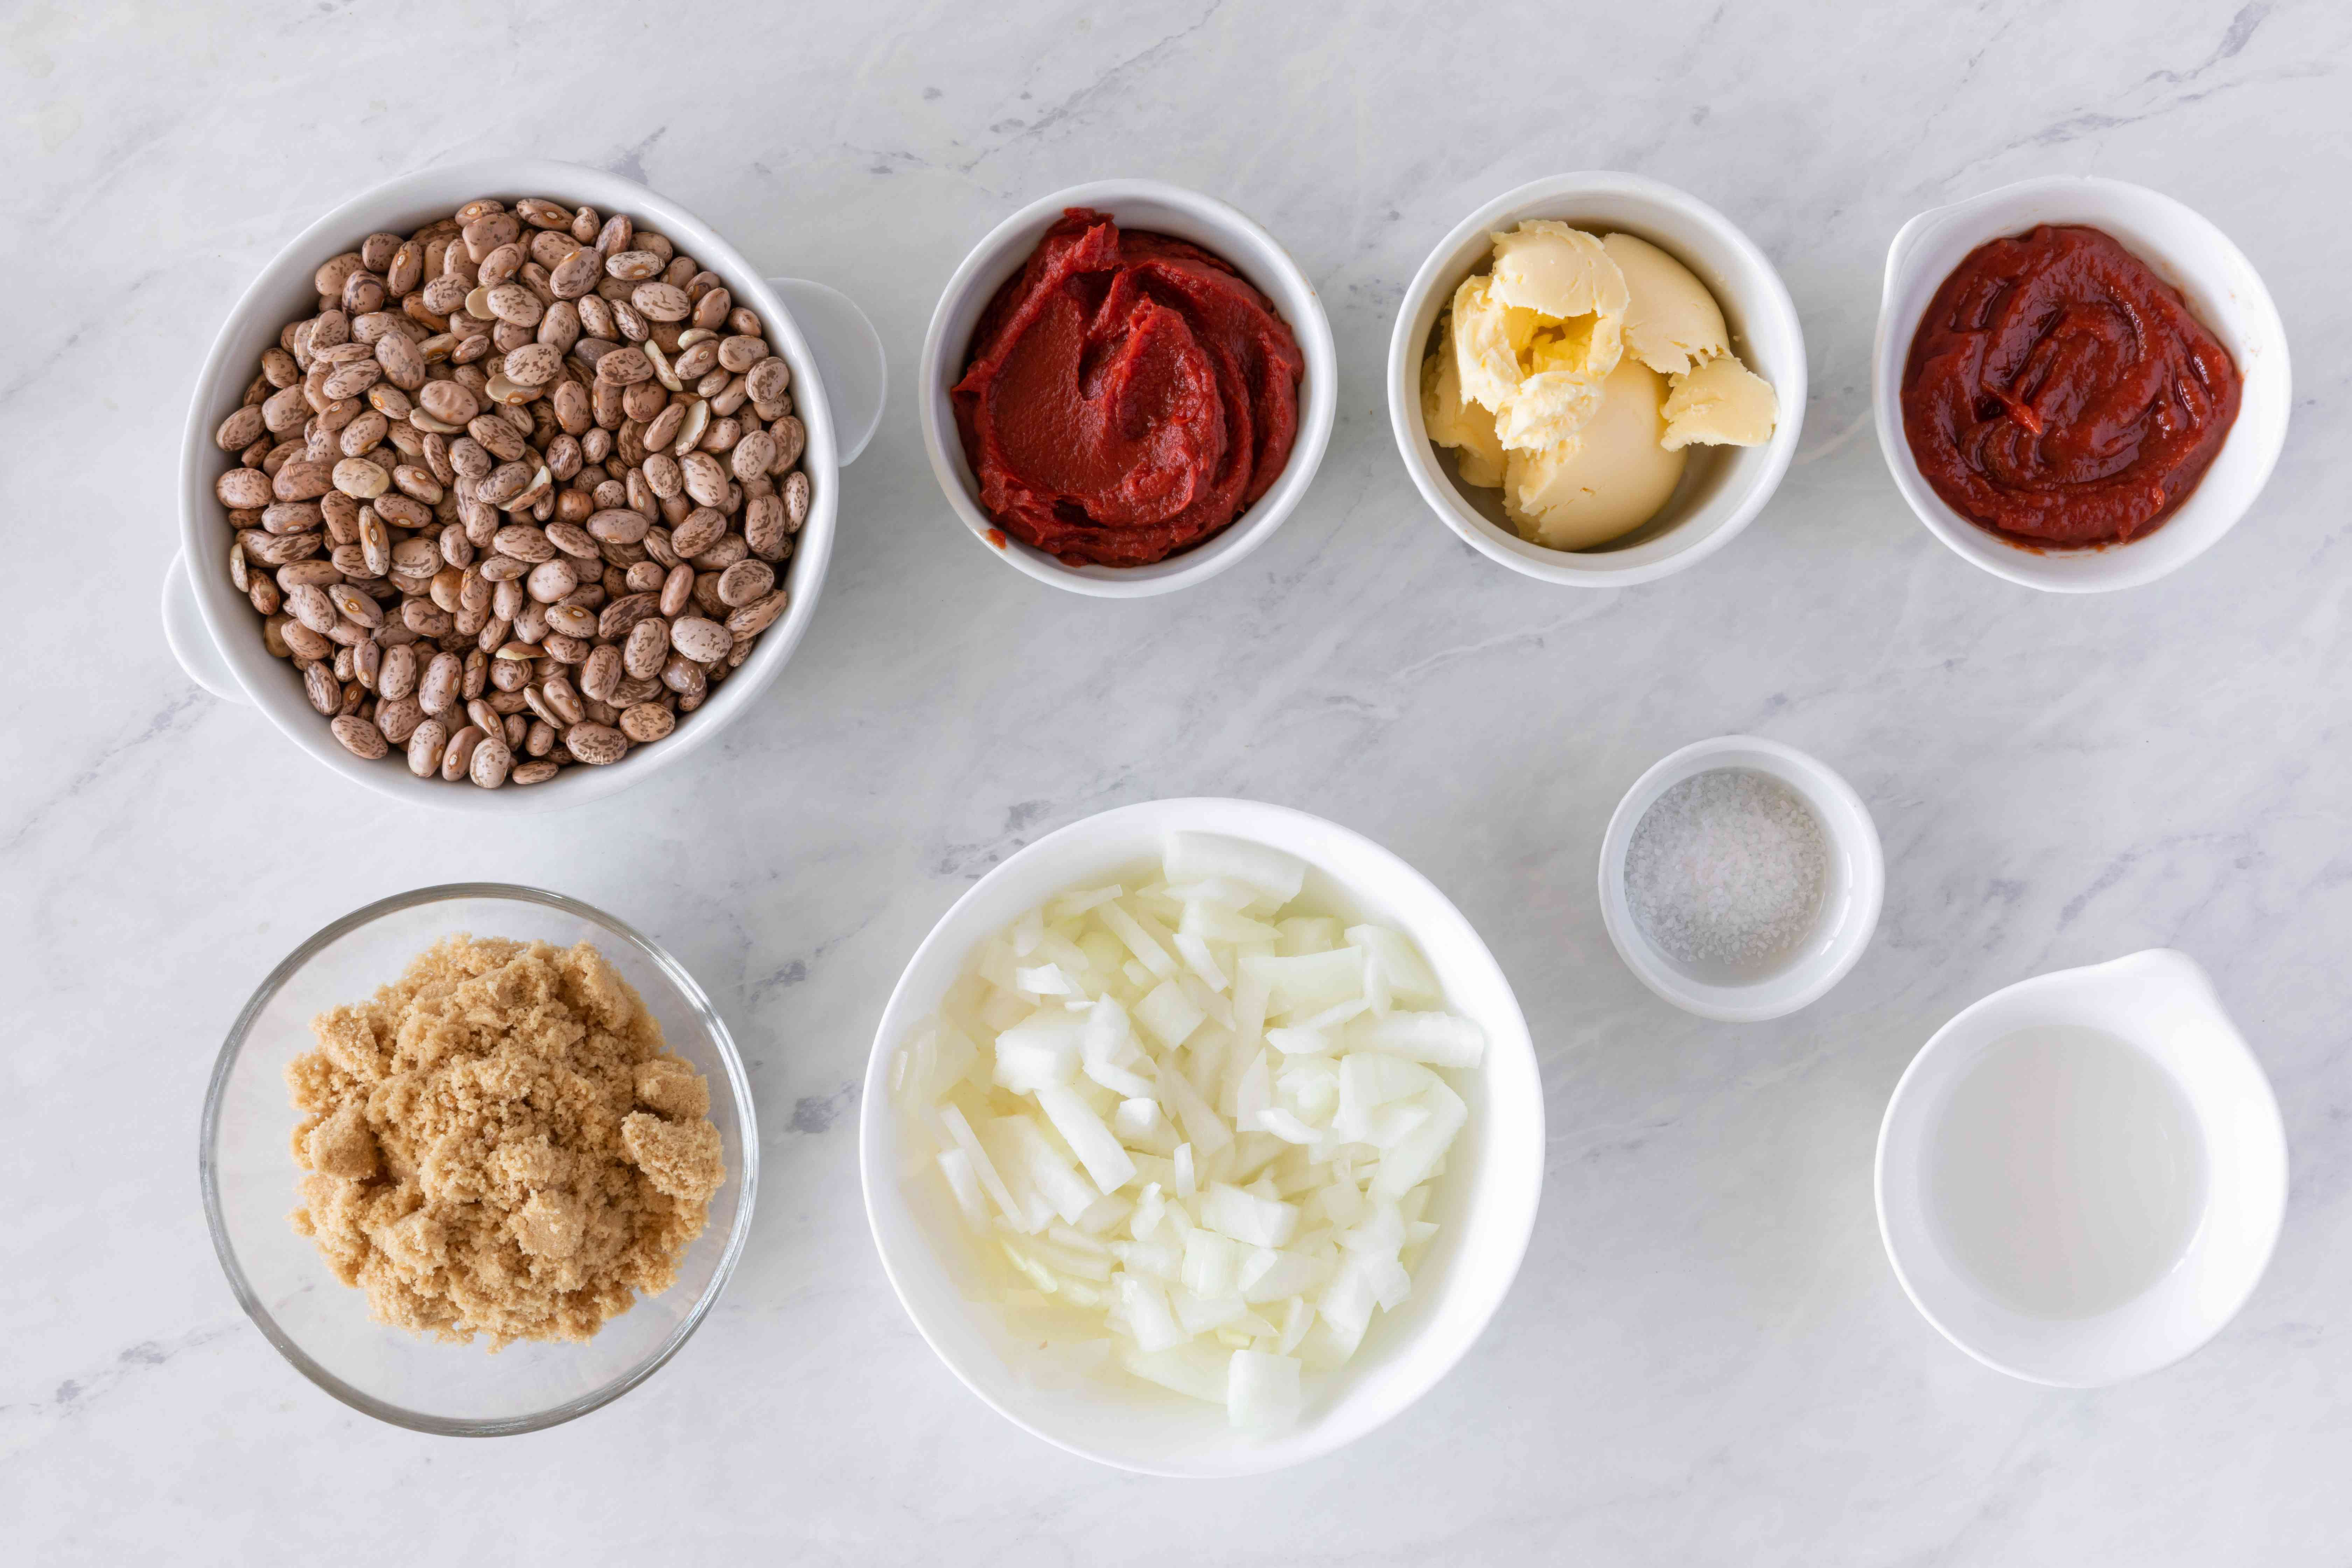 Ingredients for crock pot vegetarian baked beans